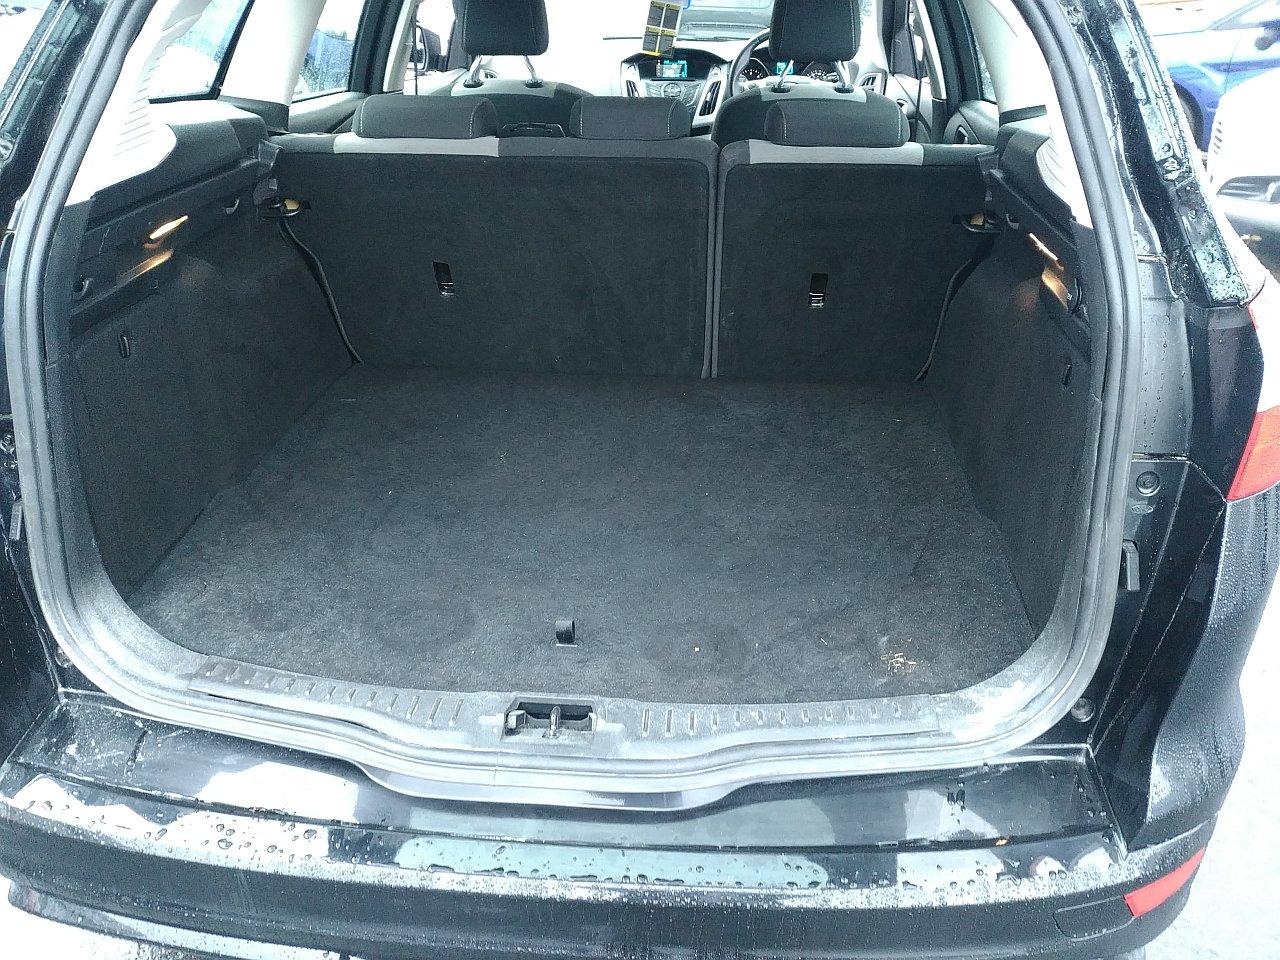 Ford Focus 2.0 TDCi 163 Zetec S 5dr Powershift image 11